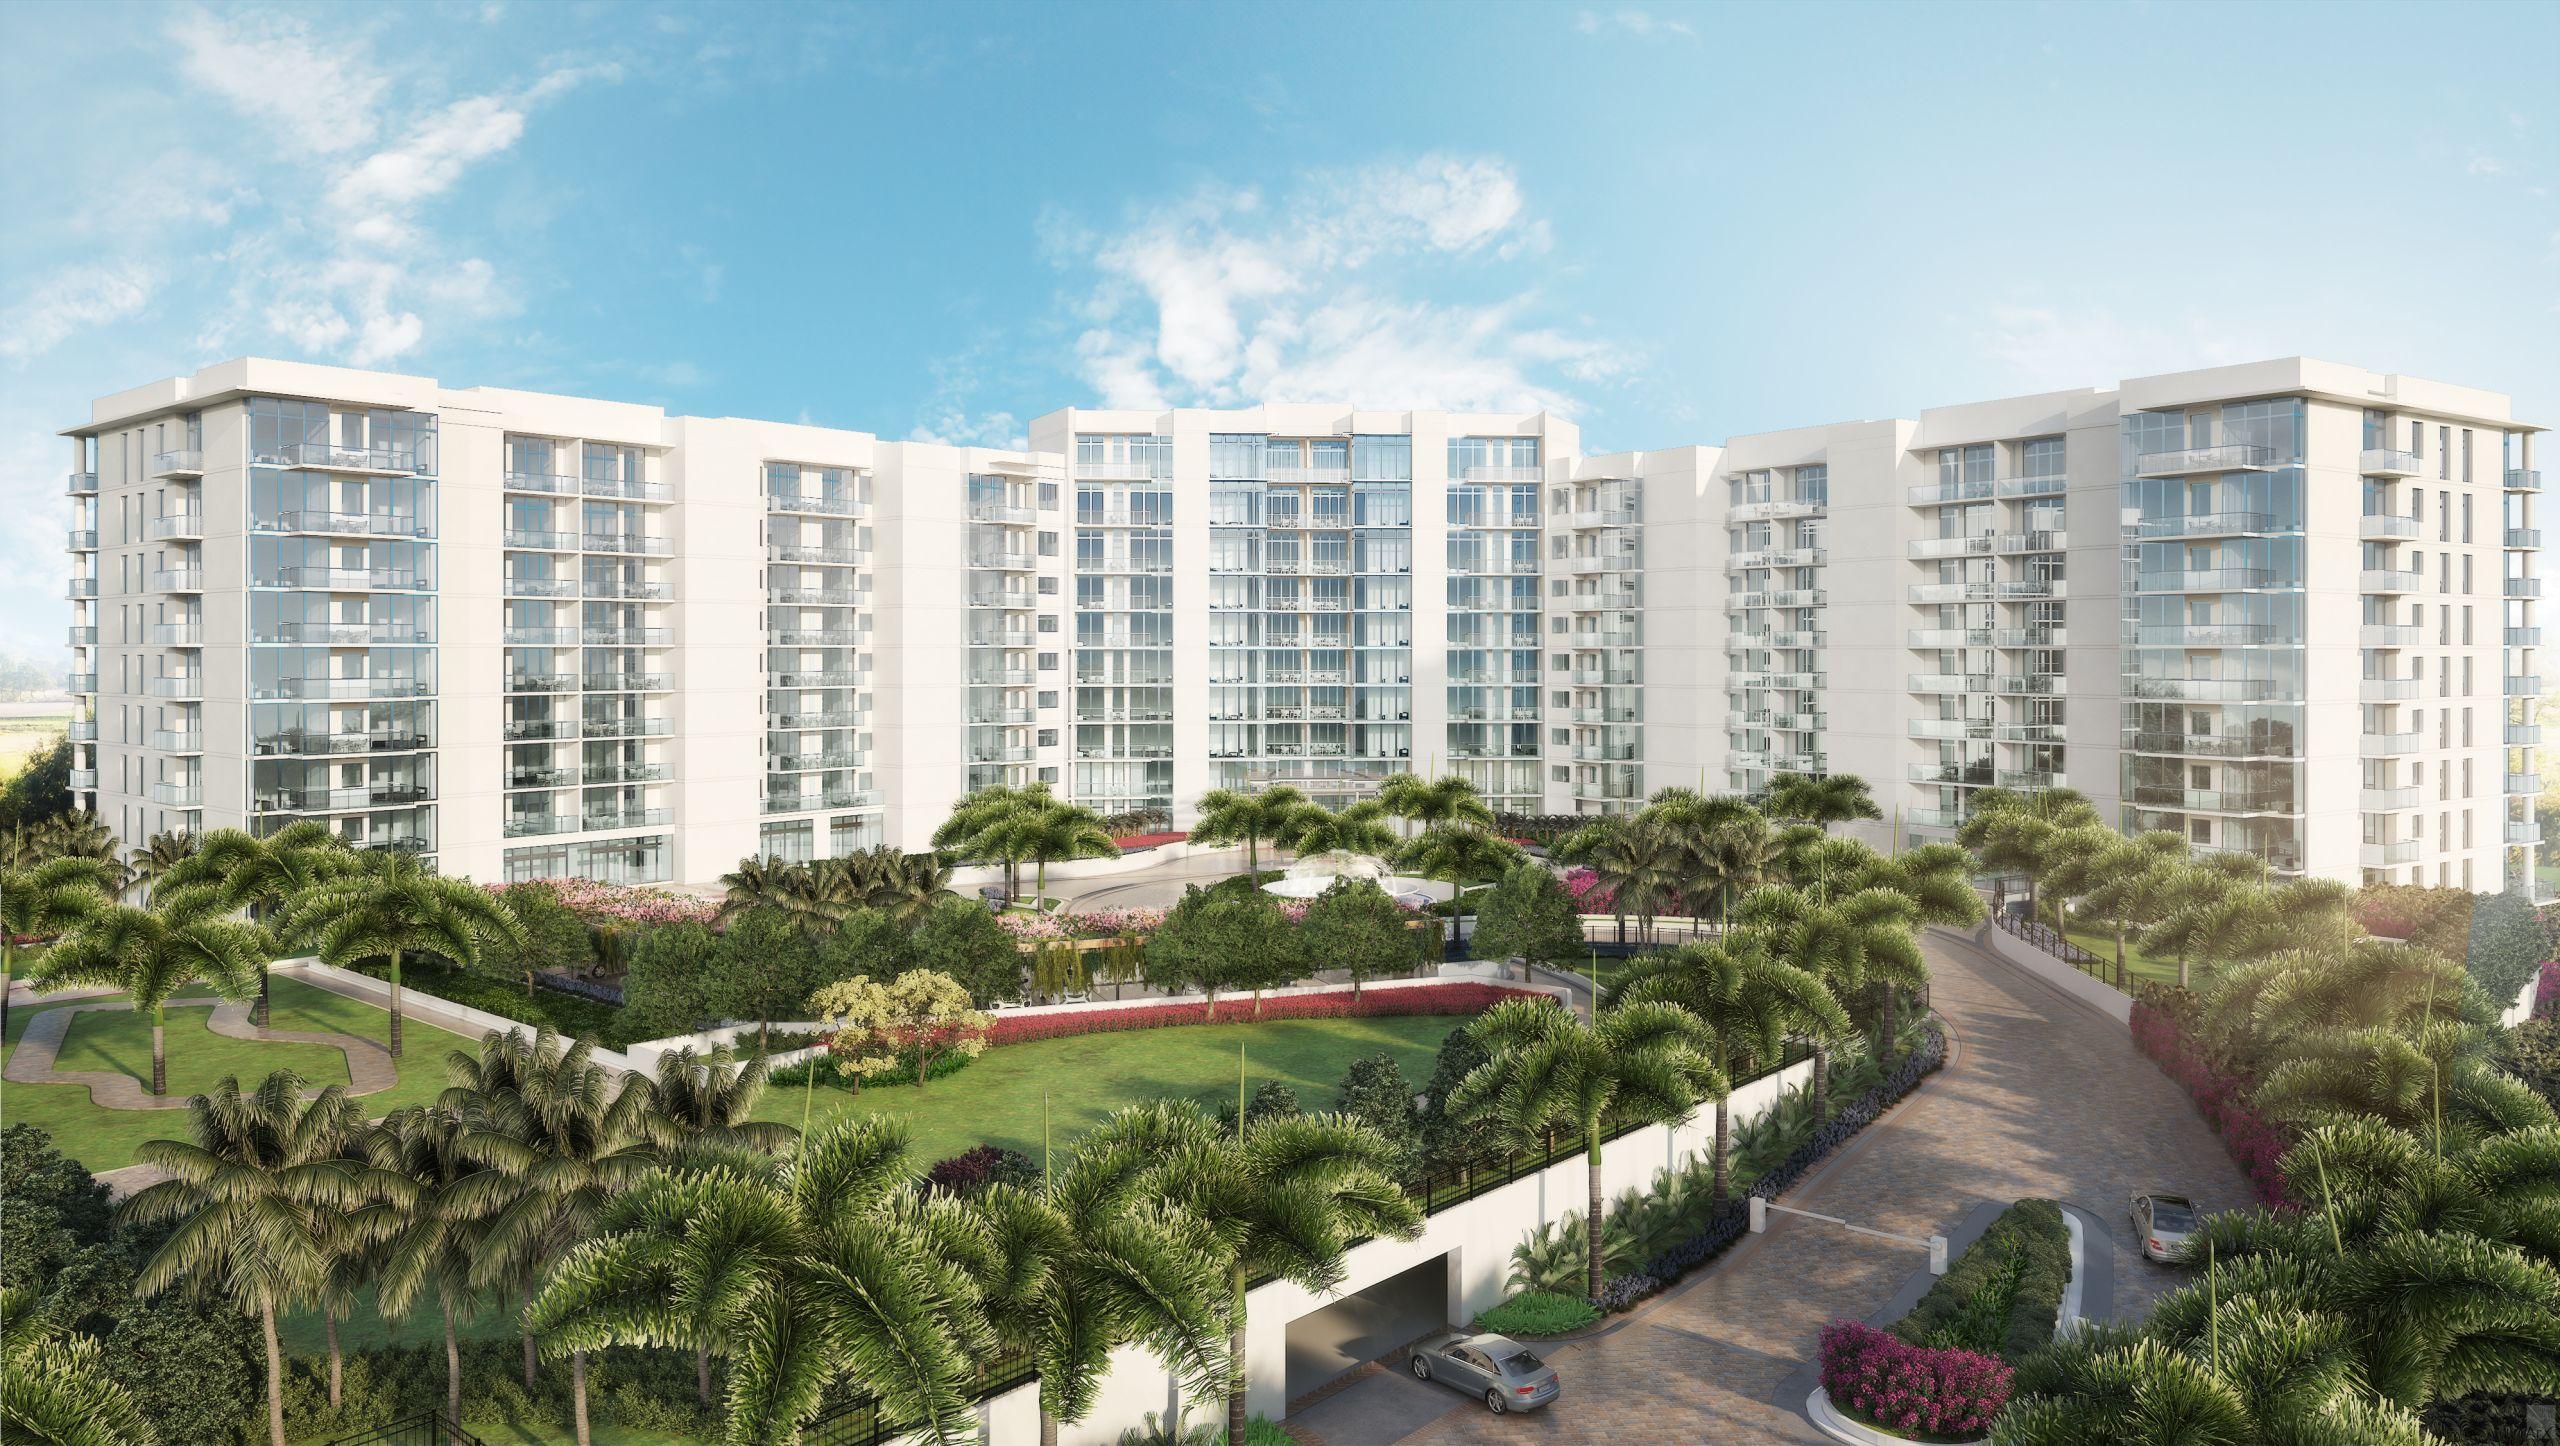 helium-akoya-05-aerial-02-1-2560x1446 Seeking the Ideal Home in New Luxury Developments